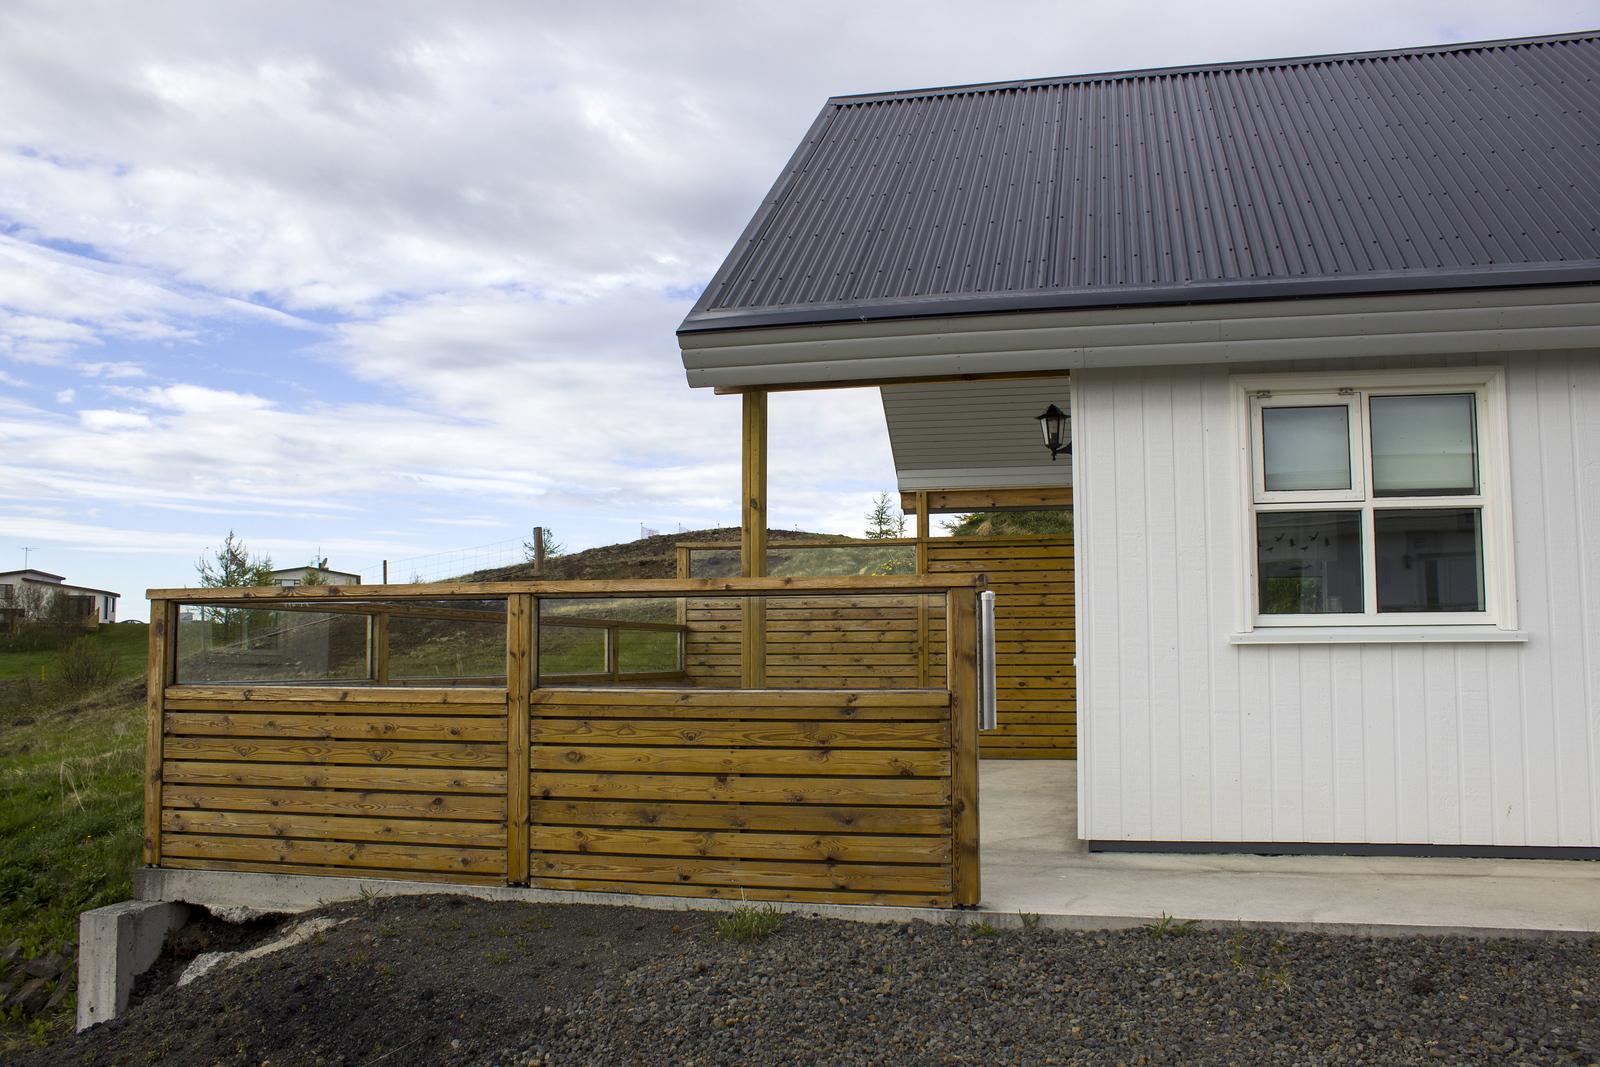 https://photos.smugmug.com/Iceland/Lake-Myvatn-2016/i-WCRdcpM/0/X3/IMG_7793-X3.jpg